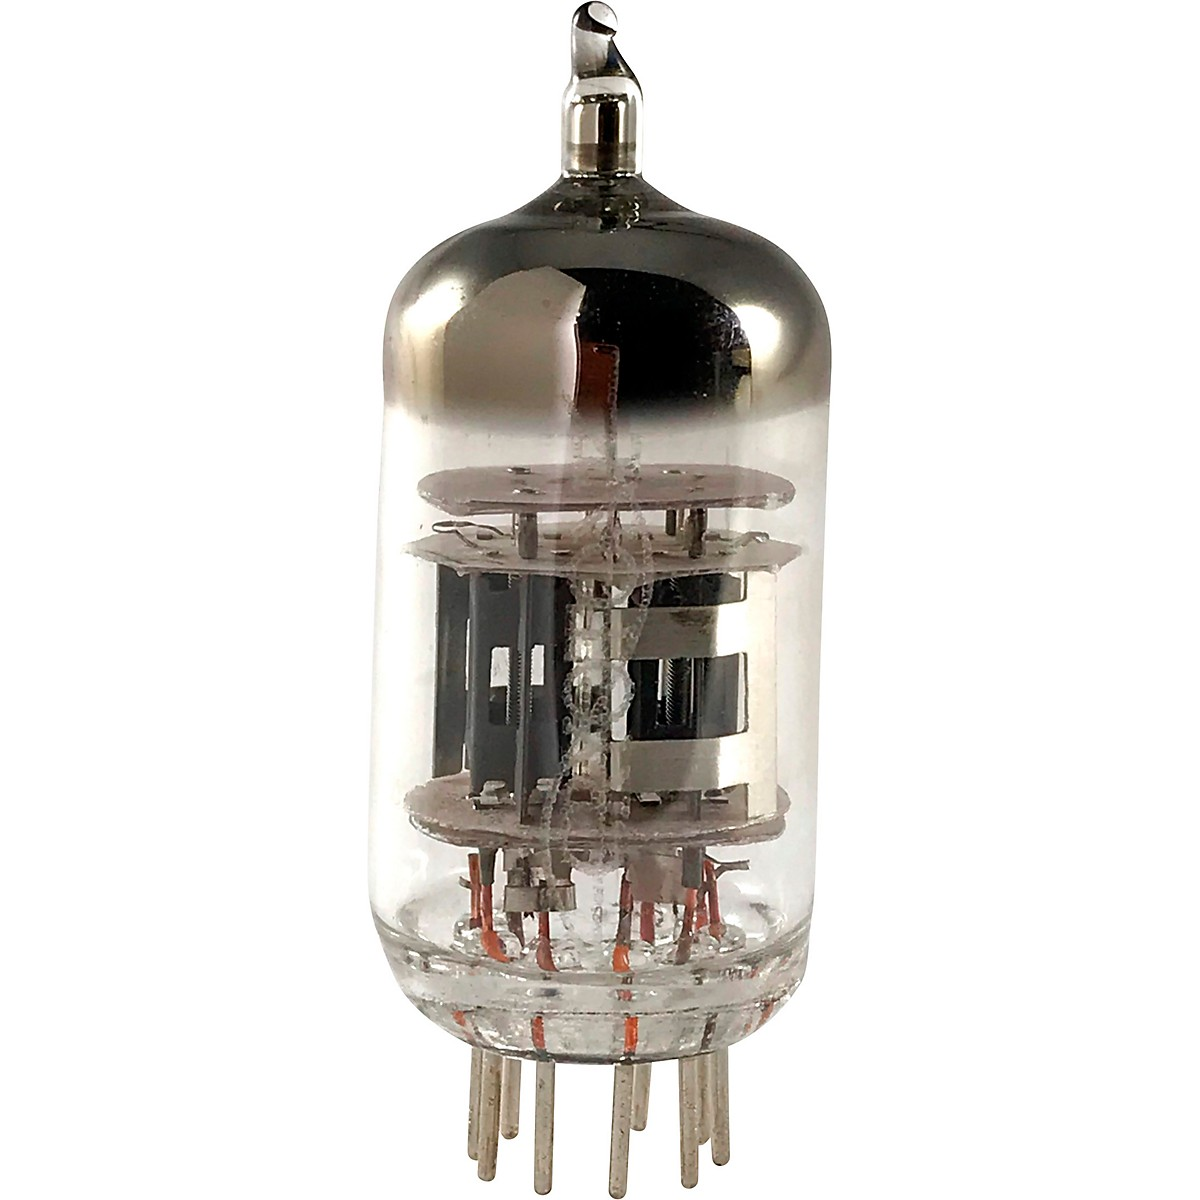 Wathen CryoTone Tubes 7025-WC Power Tube